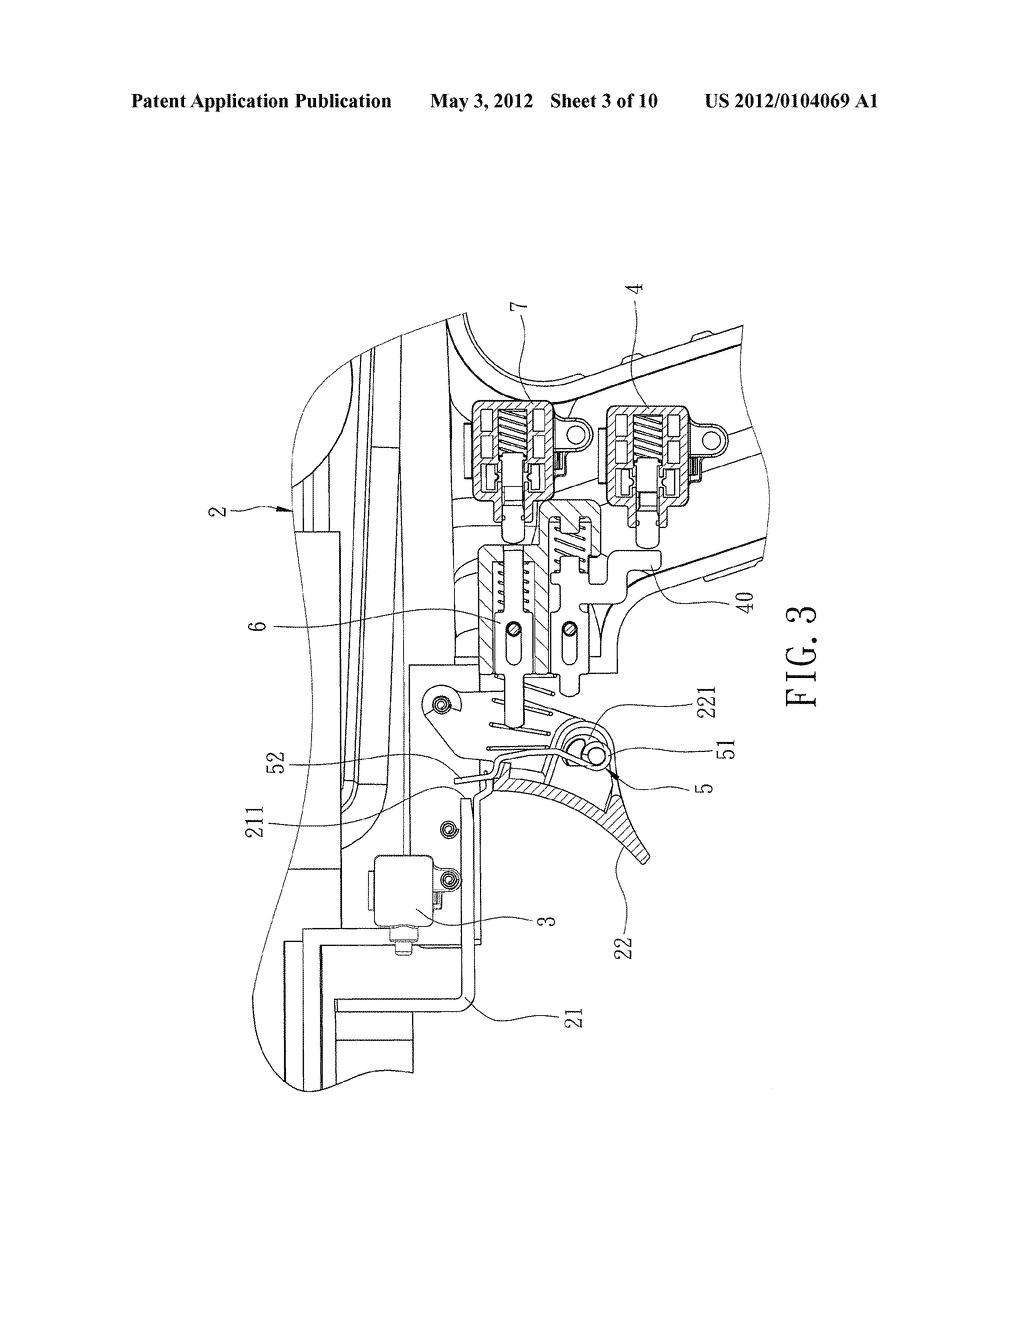 hitachi nail gun parts diagram erie zone valve wiring 16 images